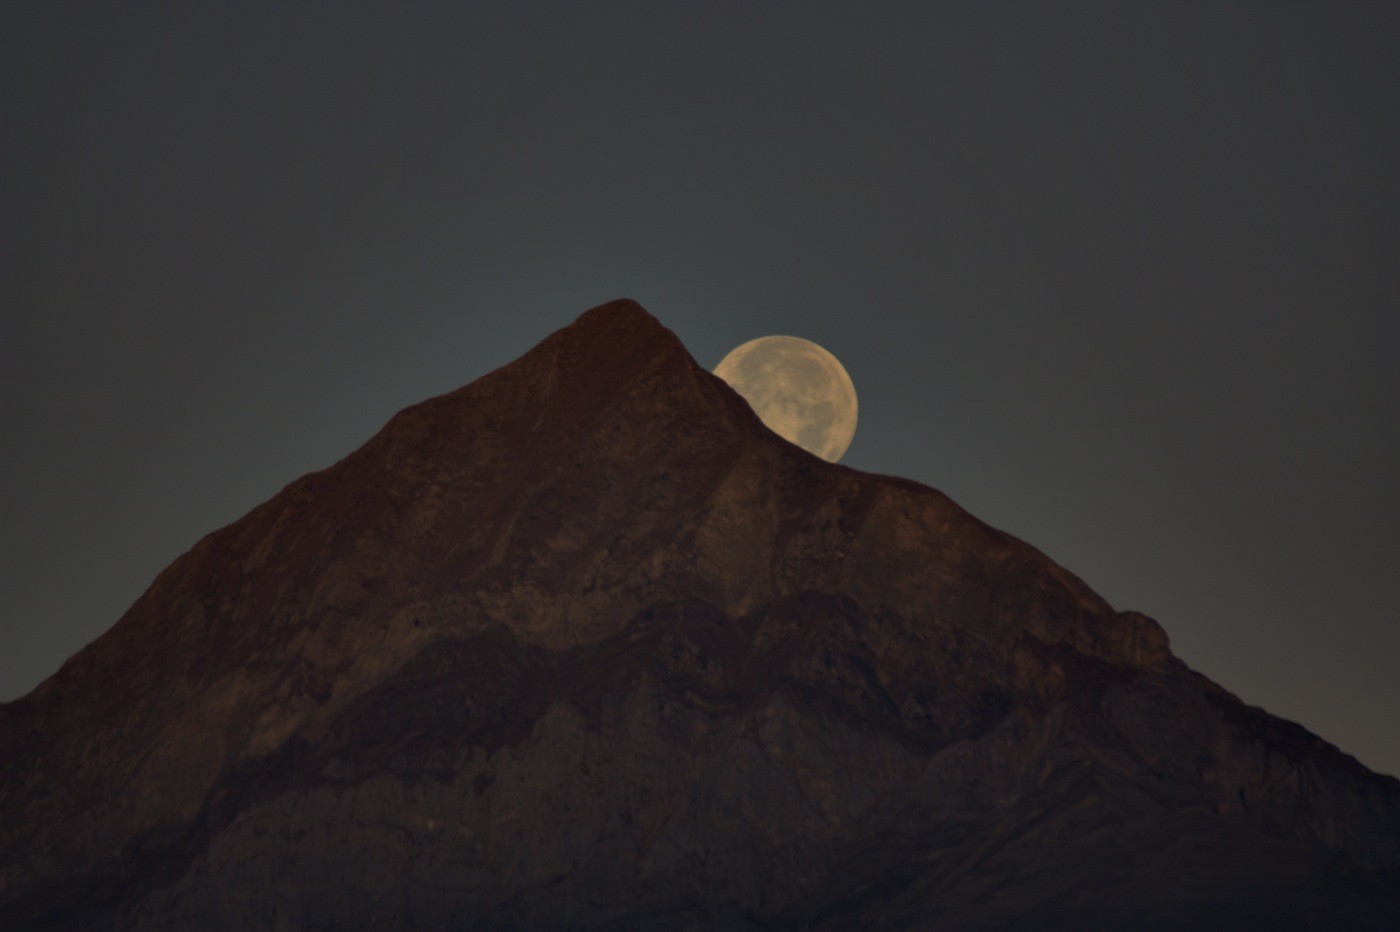 la lune percée tombe